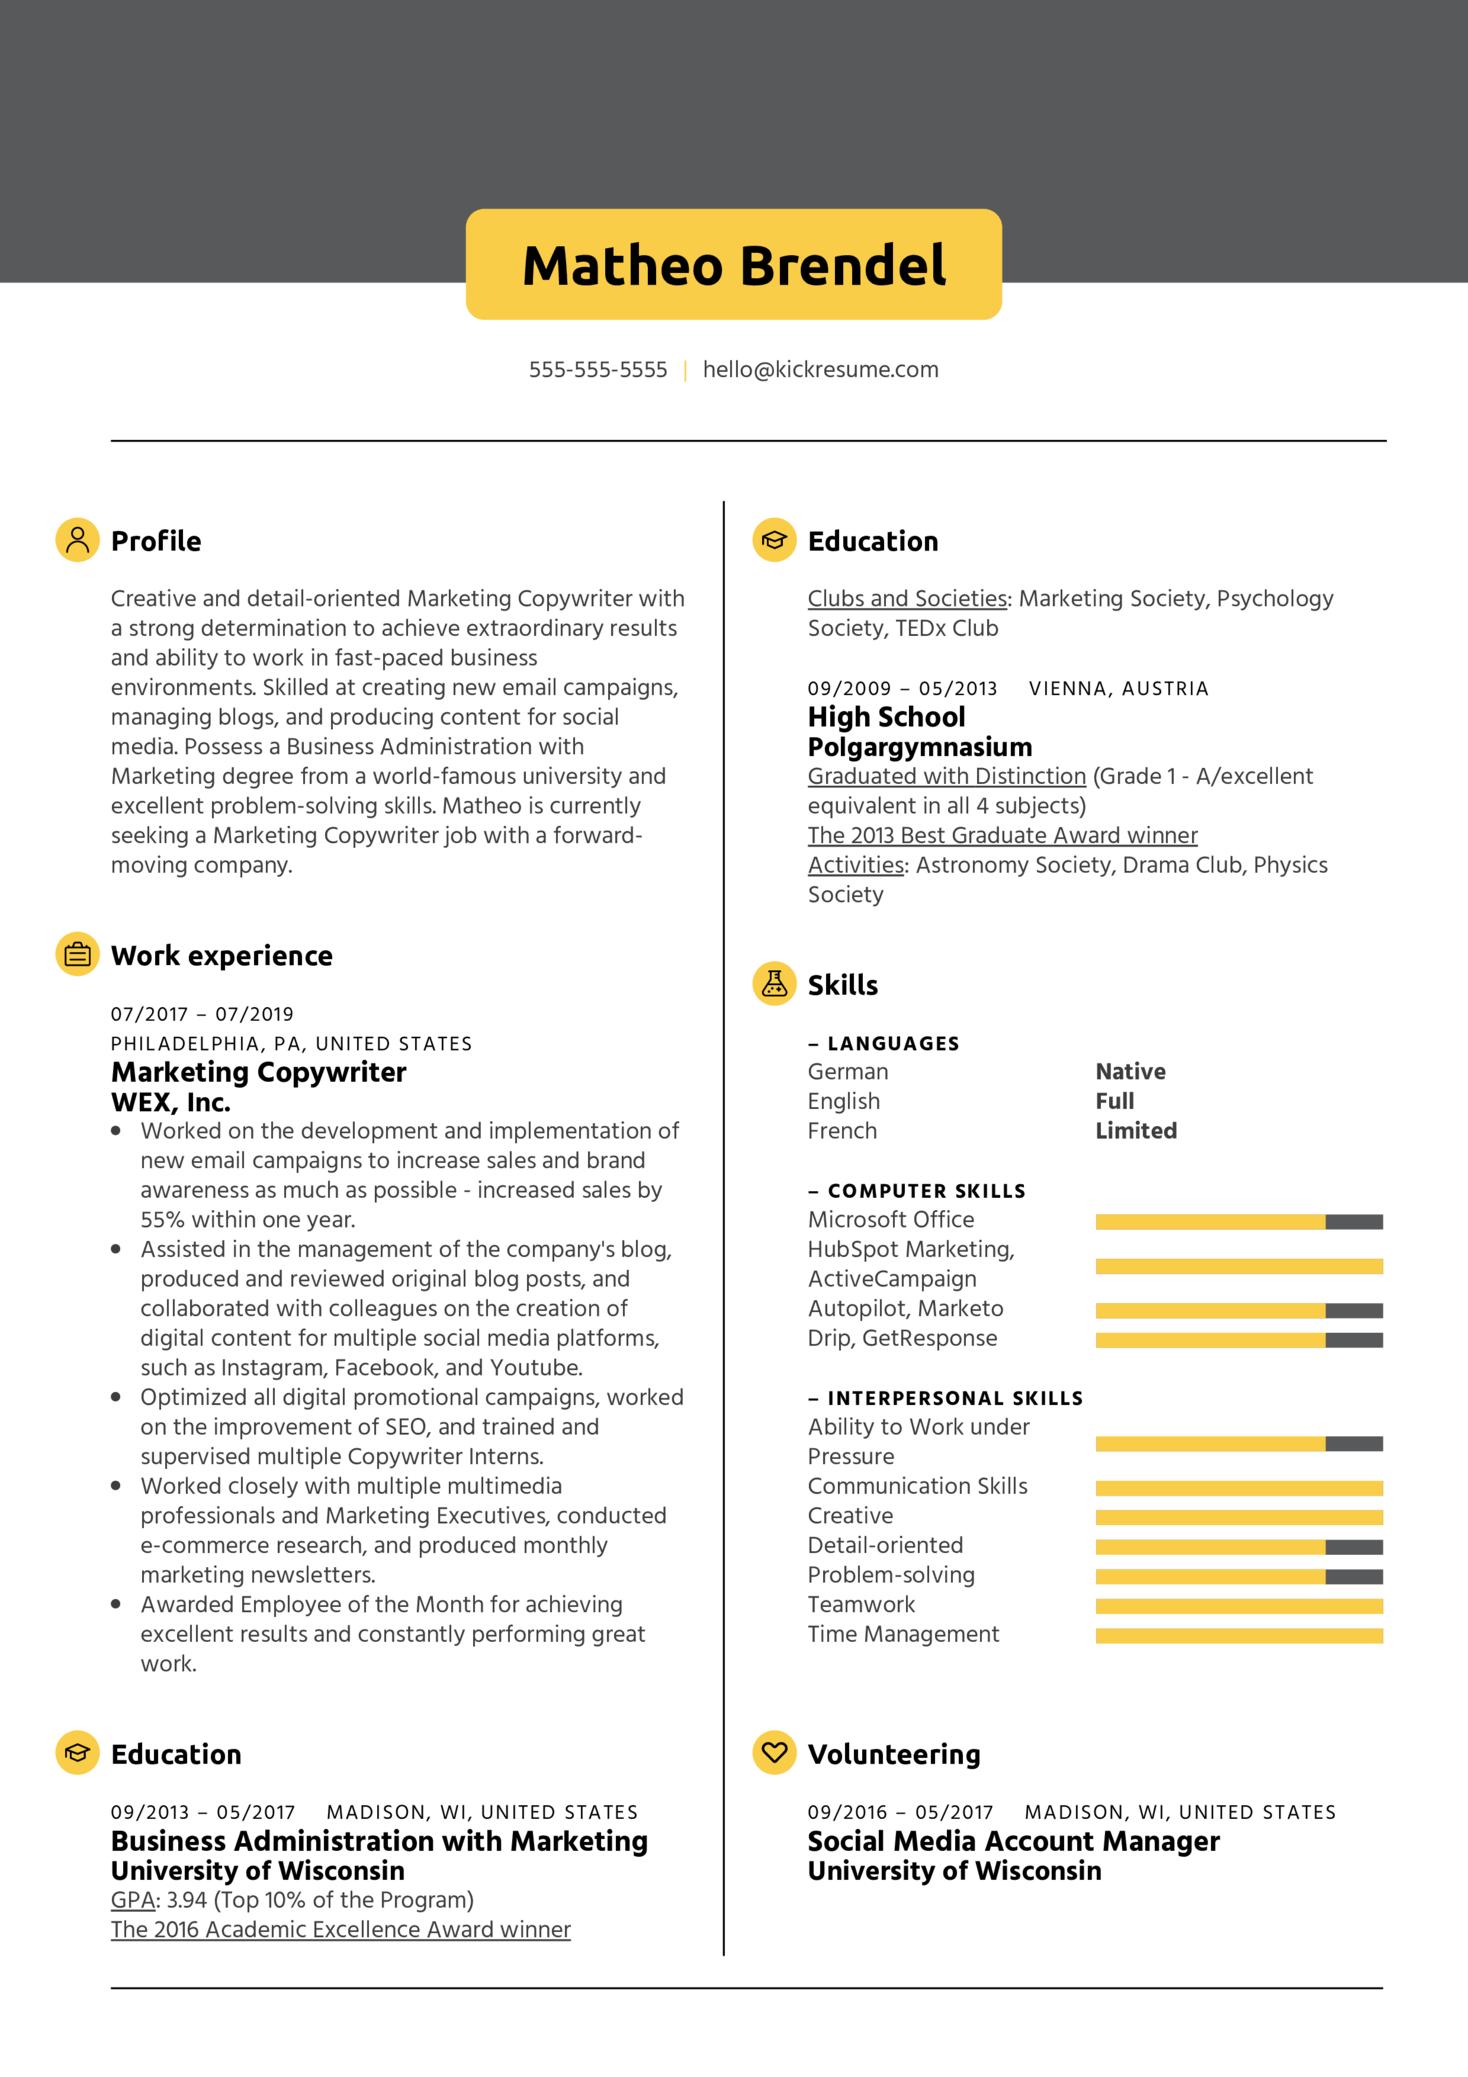 Marketing Copywriter Resume Sample (Part 1)